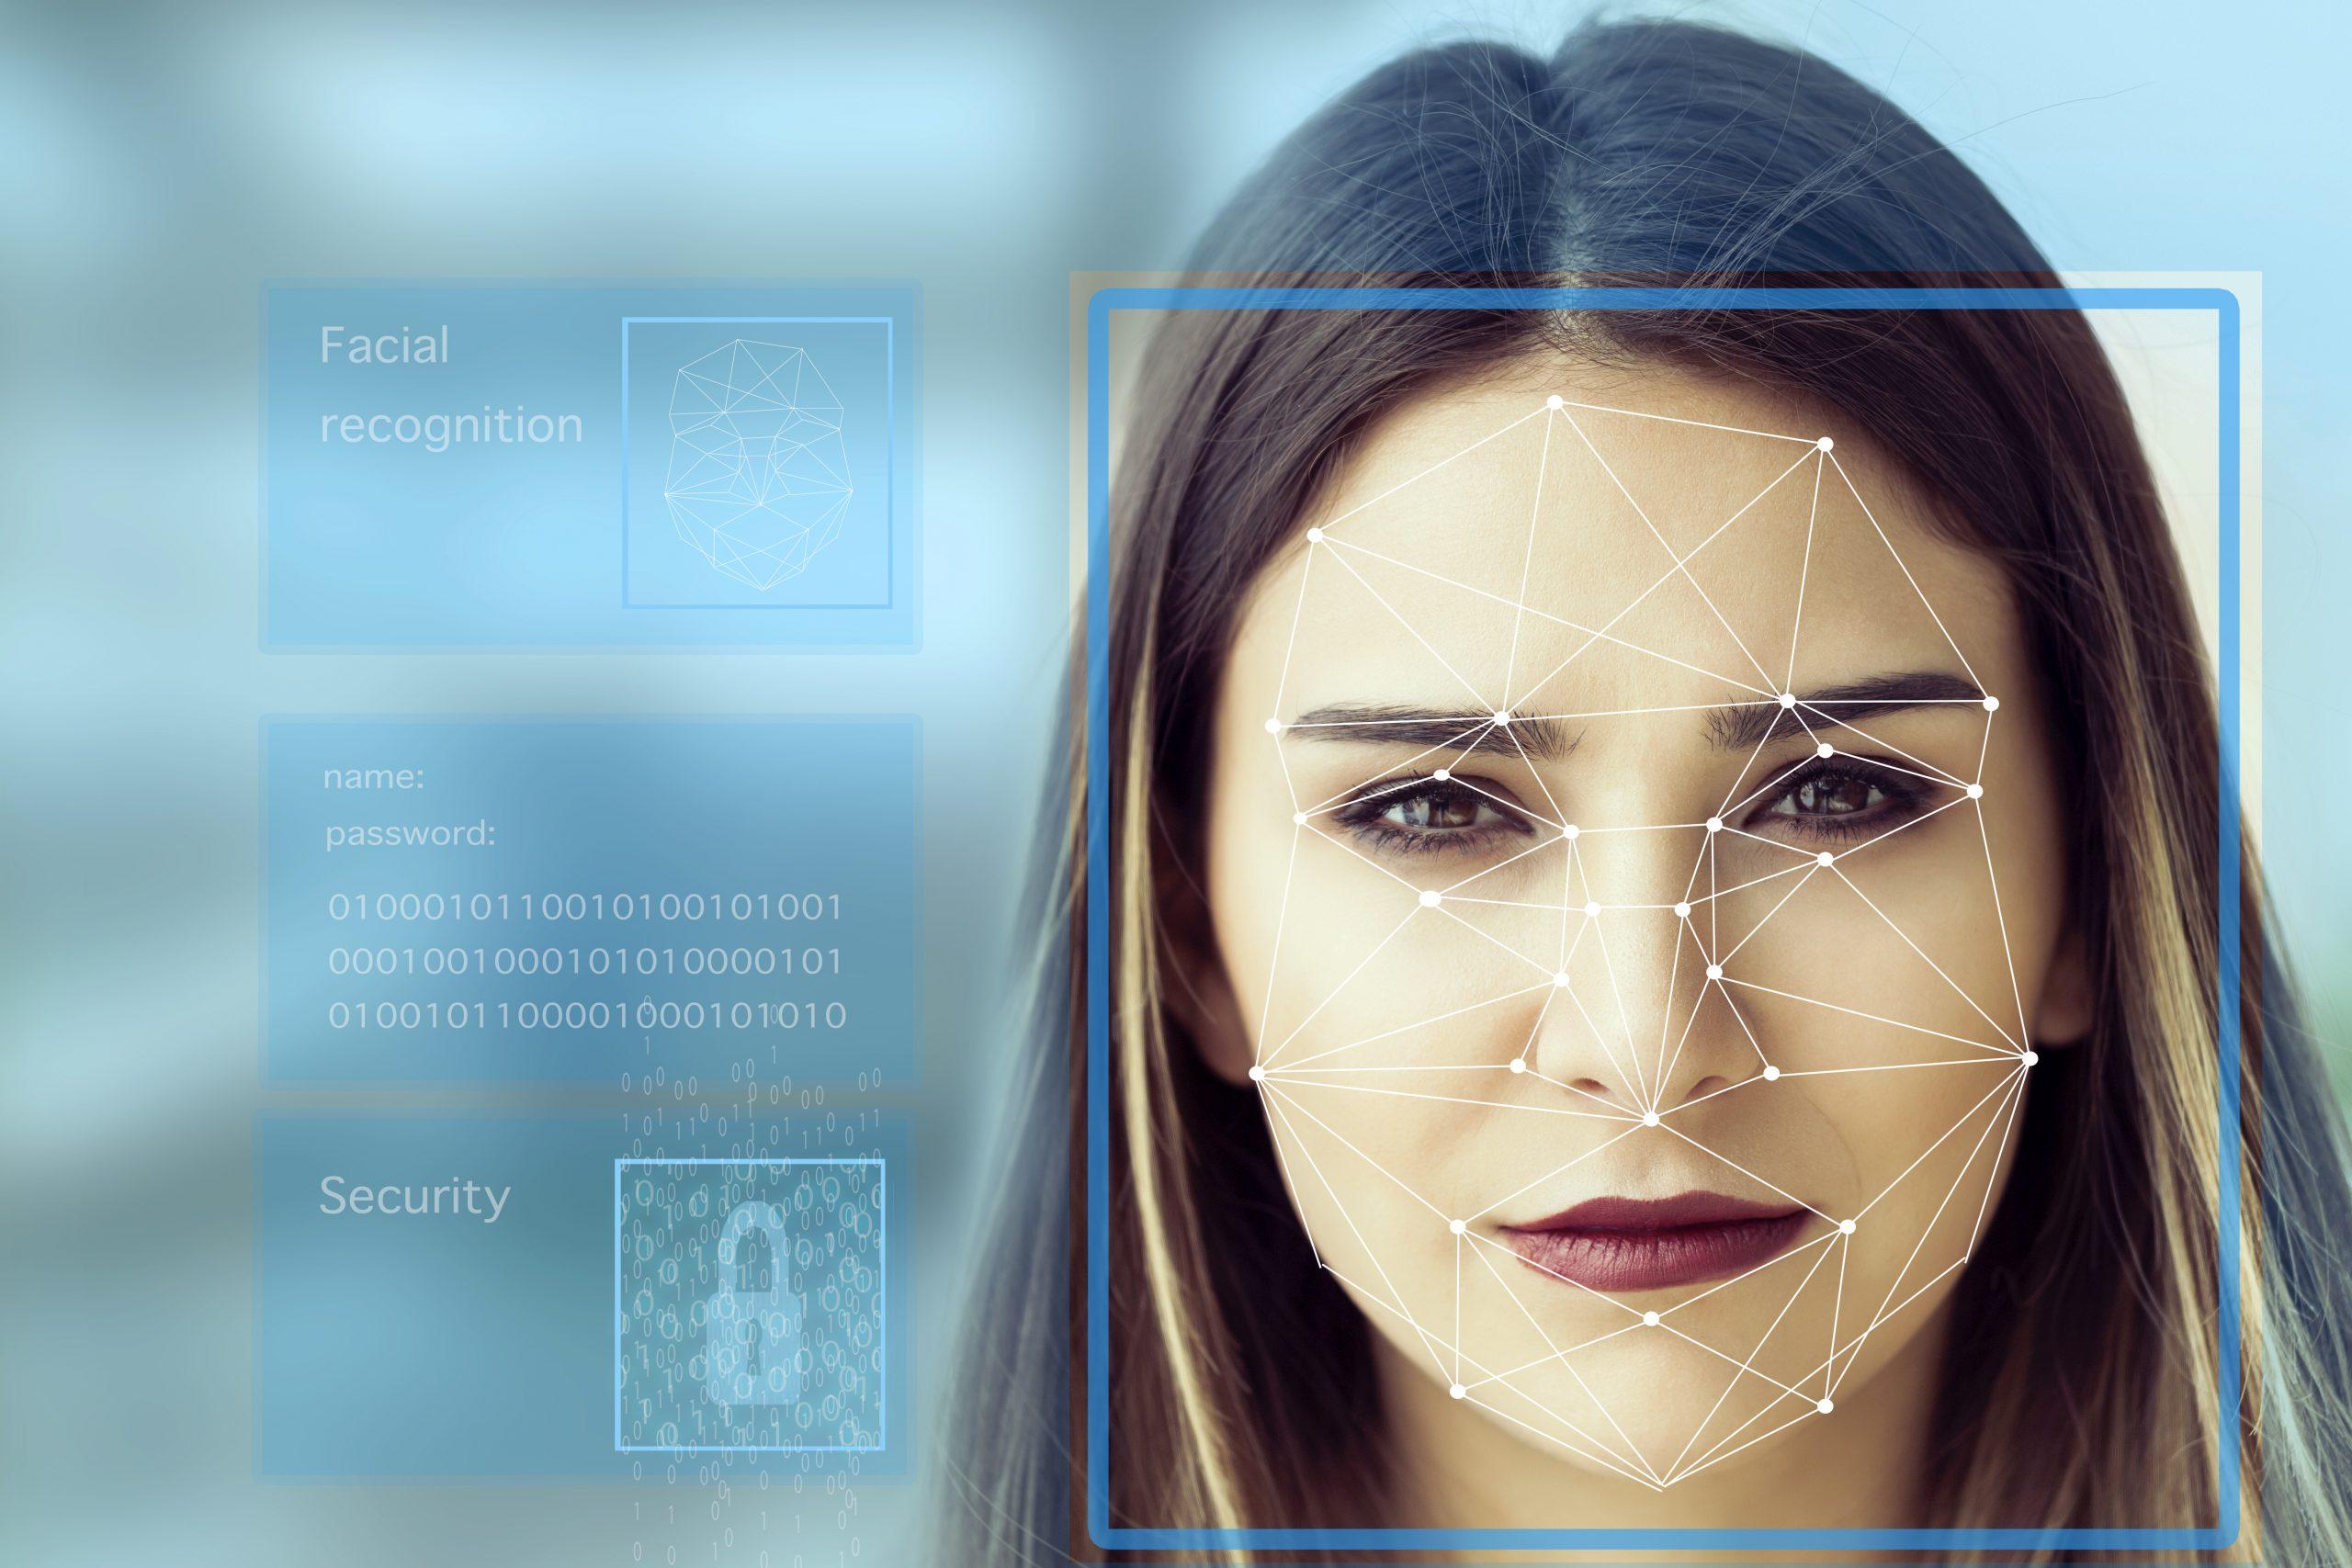 security cameras Facial Recognition System concept